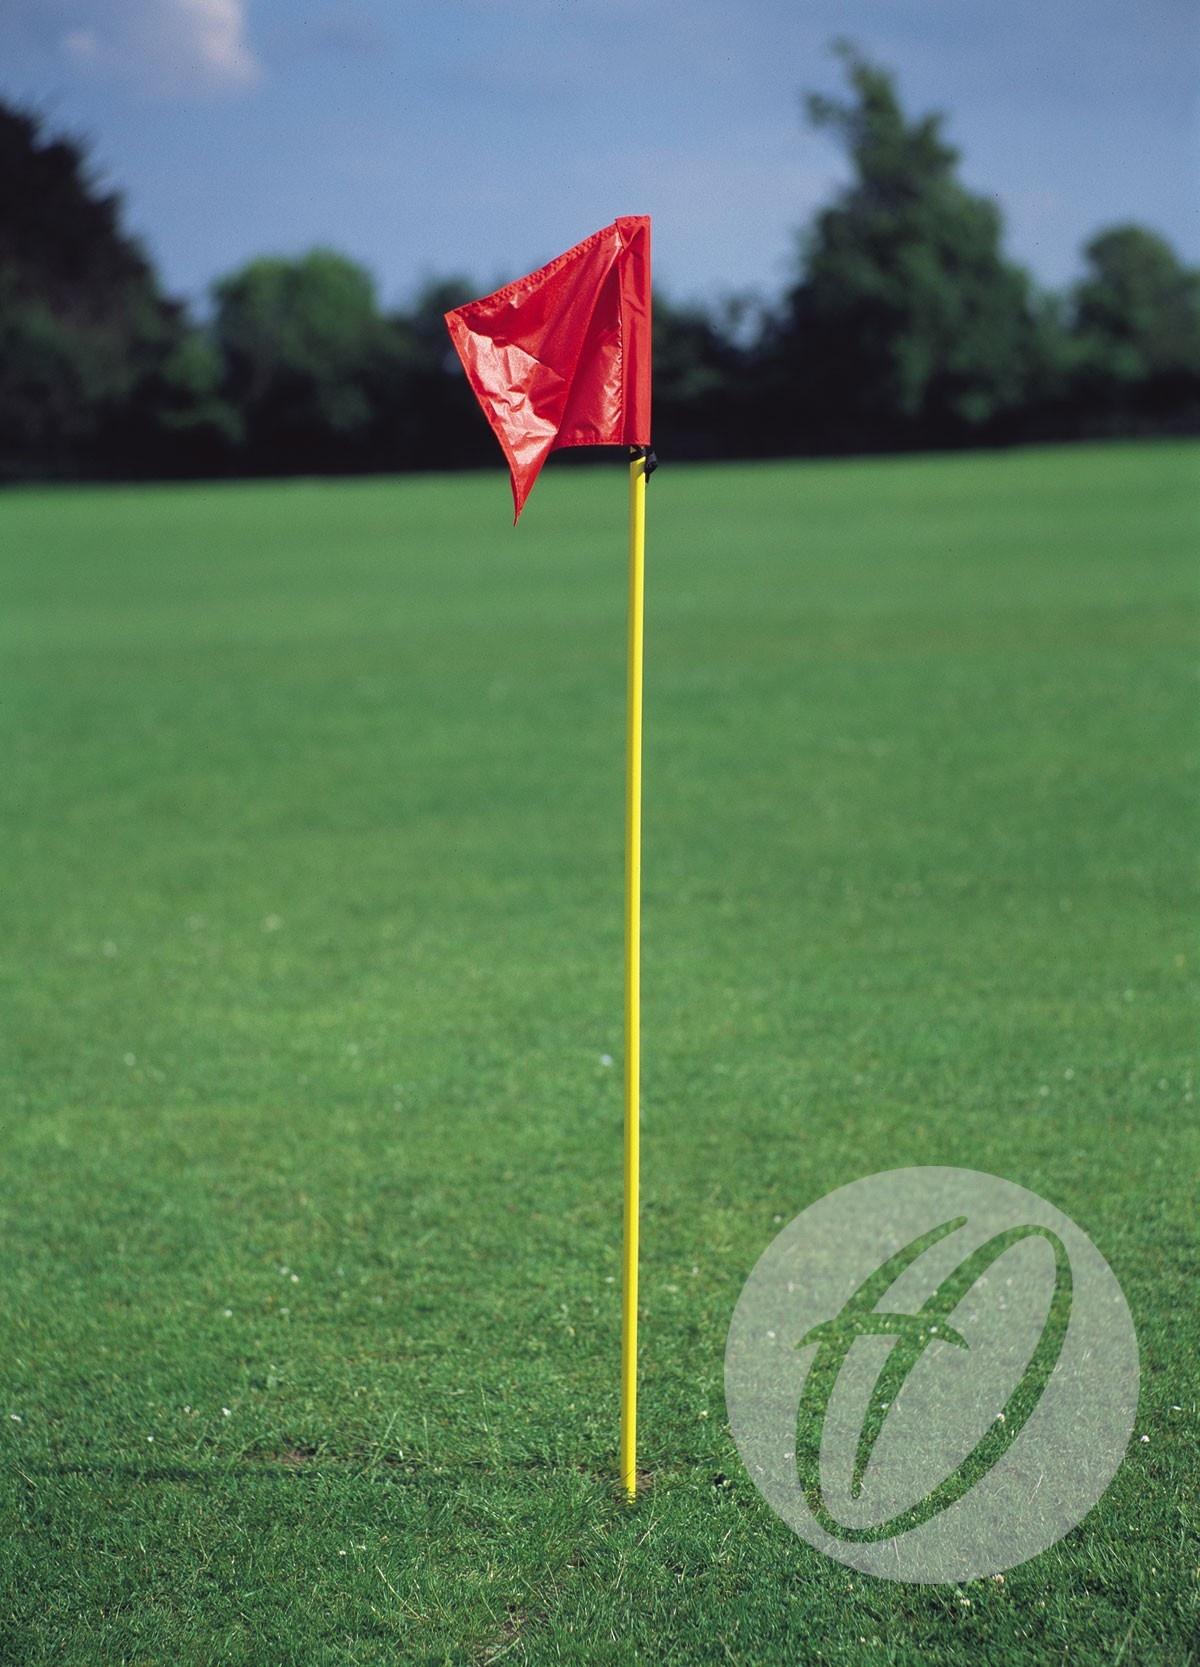 Yellow Flexible Pvc Pole With Spike Harrod Sport